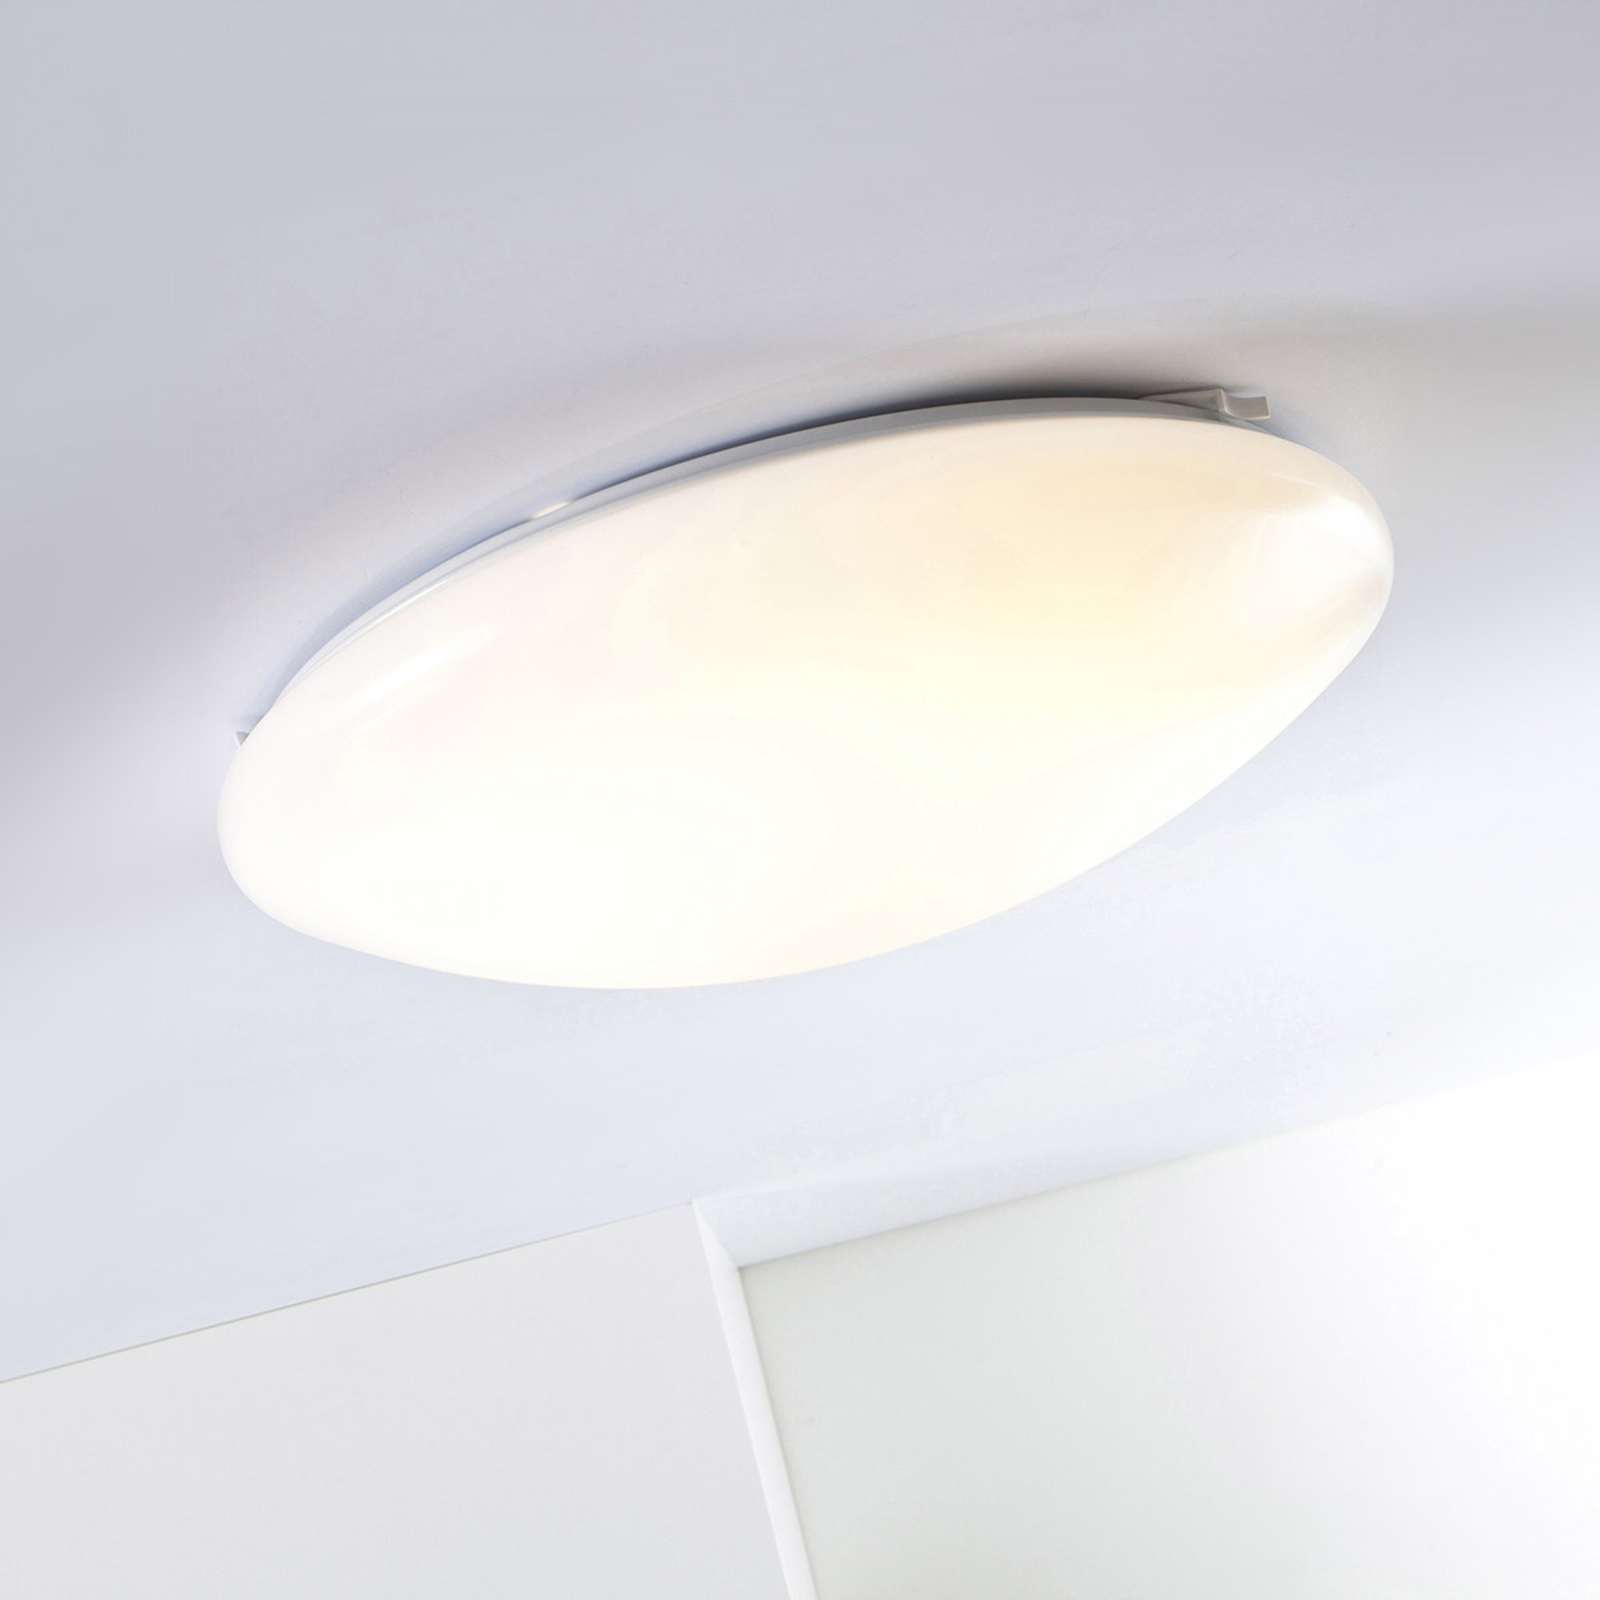 LED Basis ronde plafondlamp van AEG, 14 W